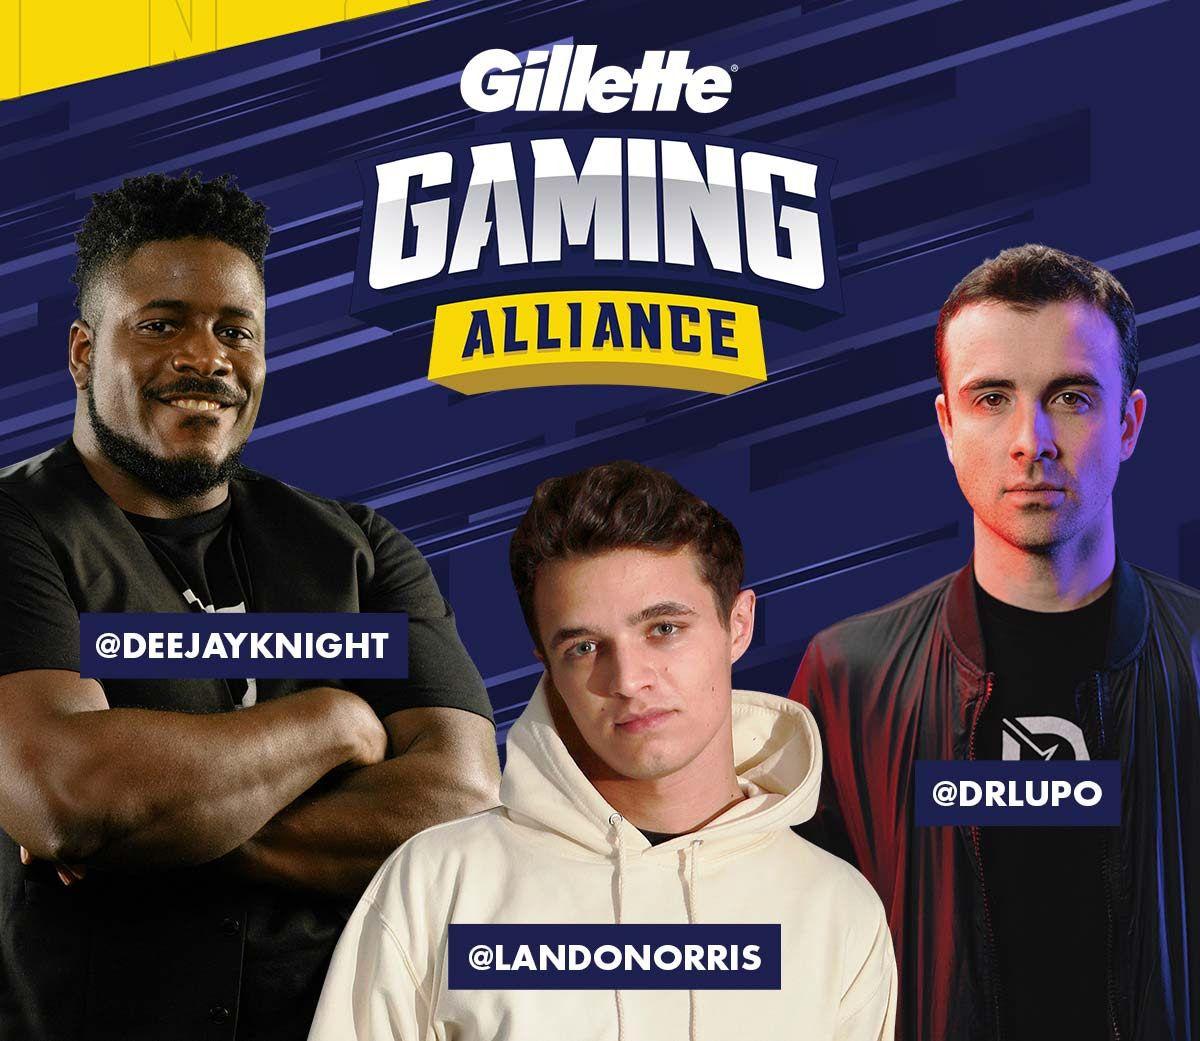 Gillette: 100 Bits gratis para Twitch